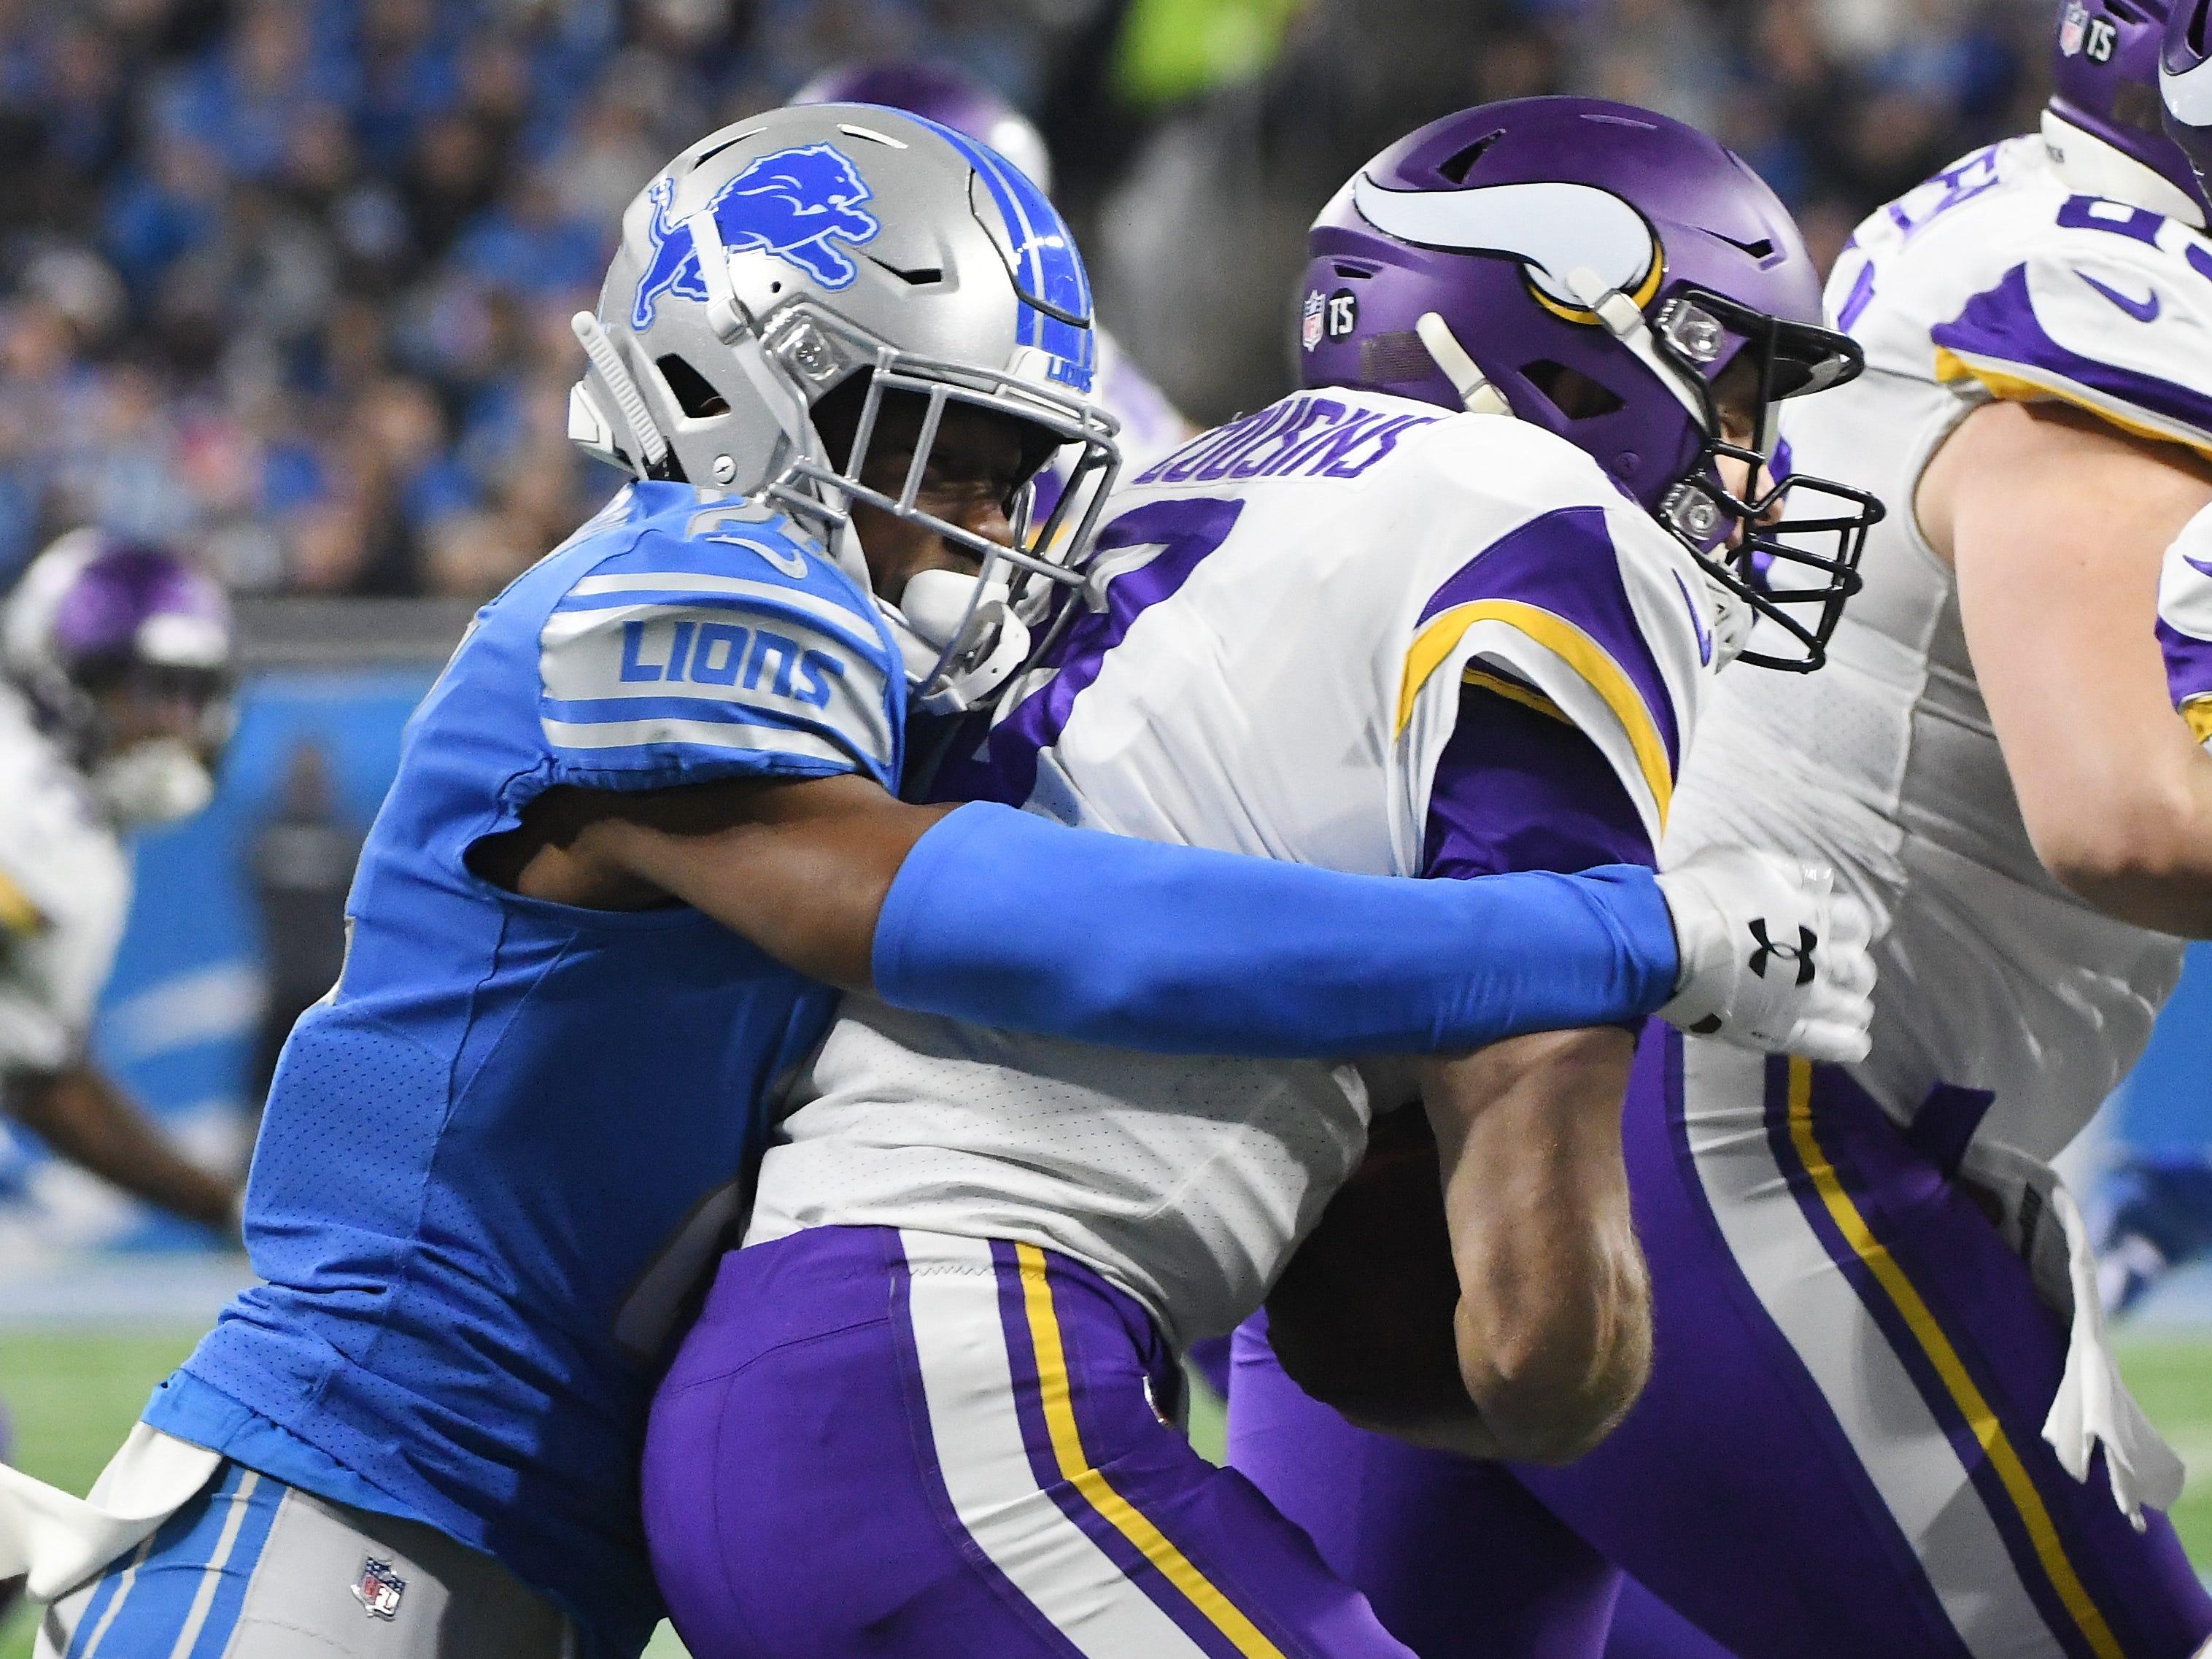 Lions' Nevin Lawson sacks Vikings quarterback Kirk Cousins in the first quarter.